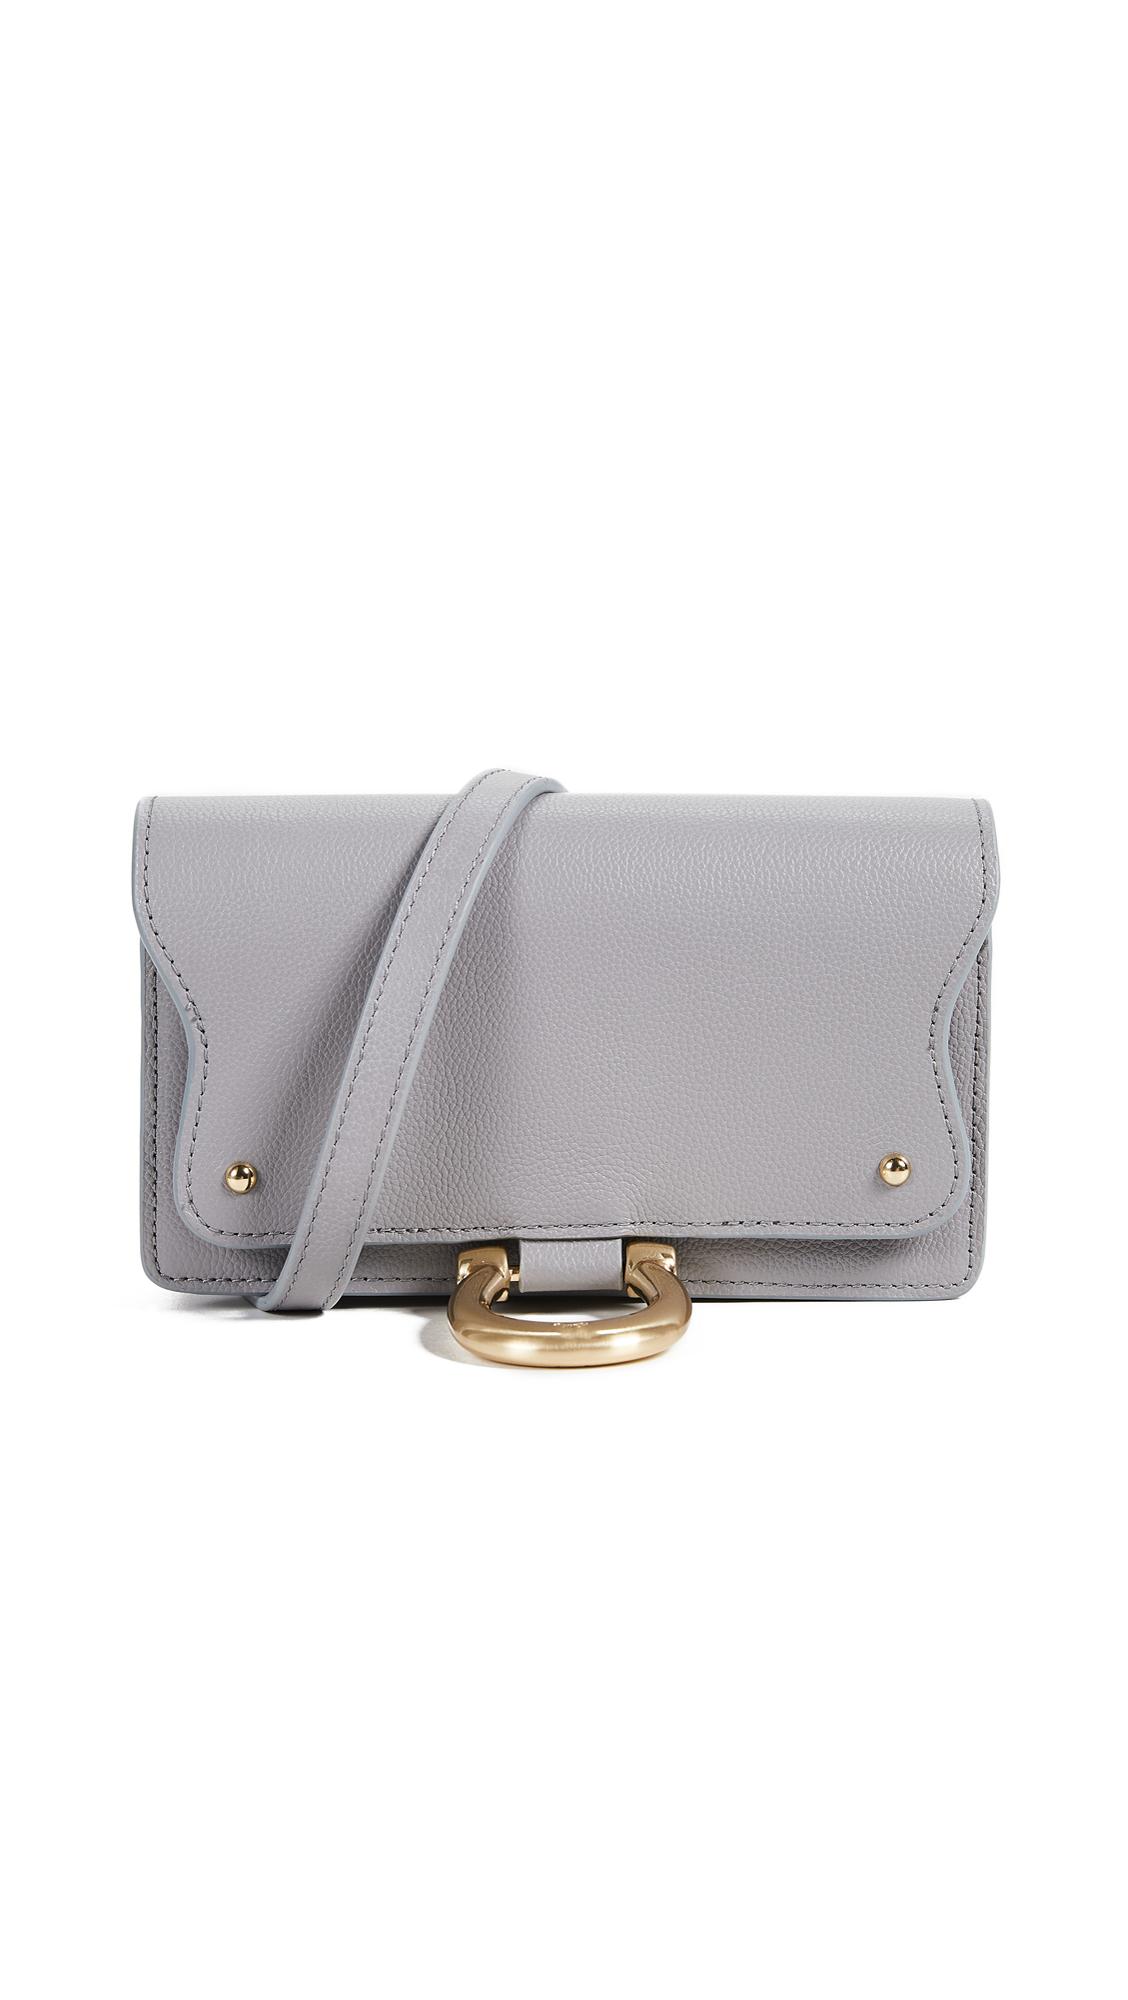 SANCIA The Paris Mini Bag